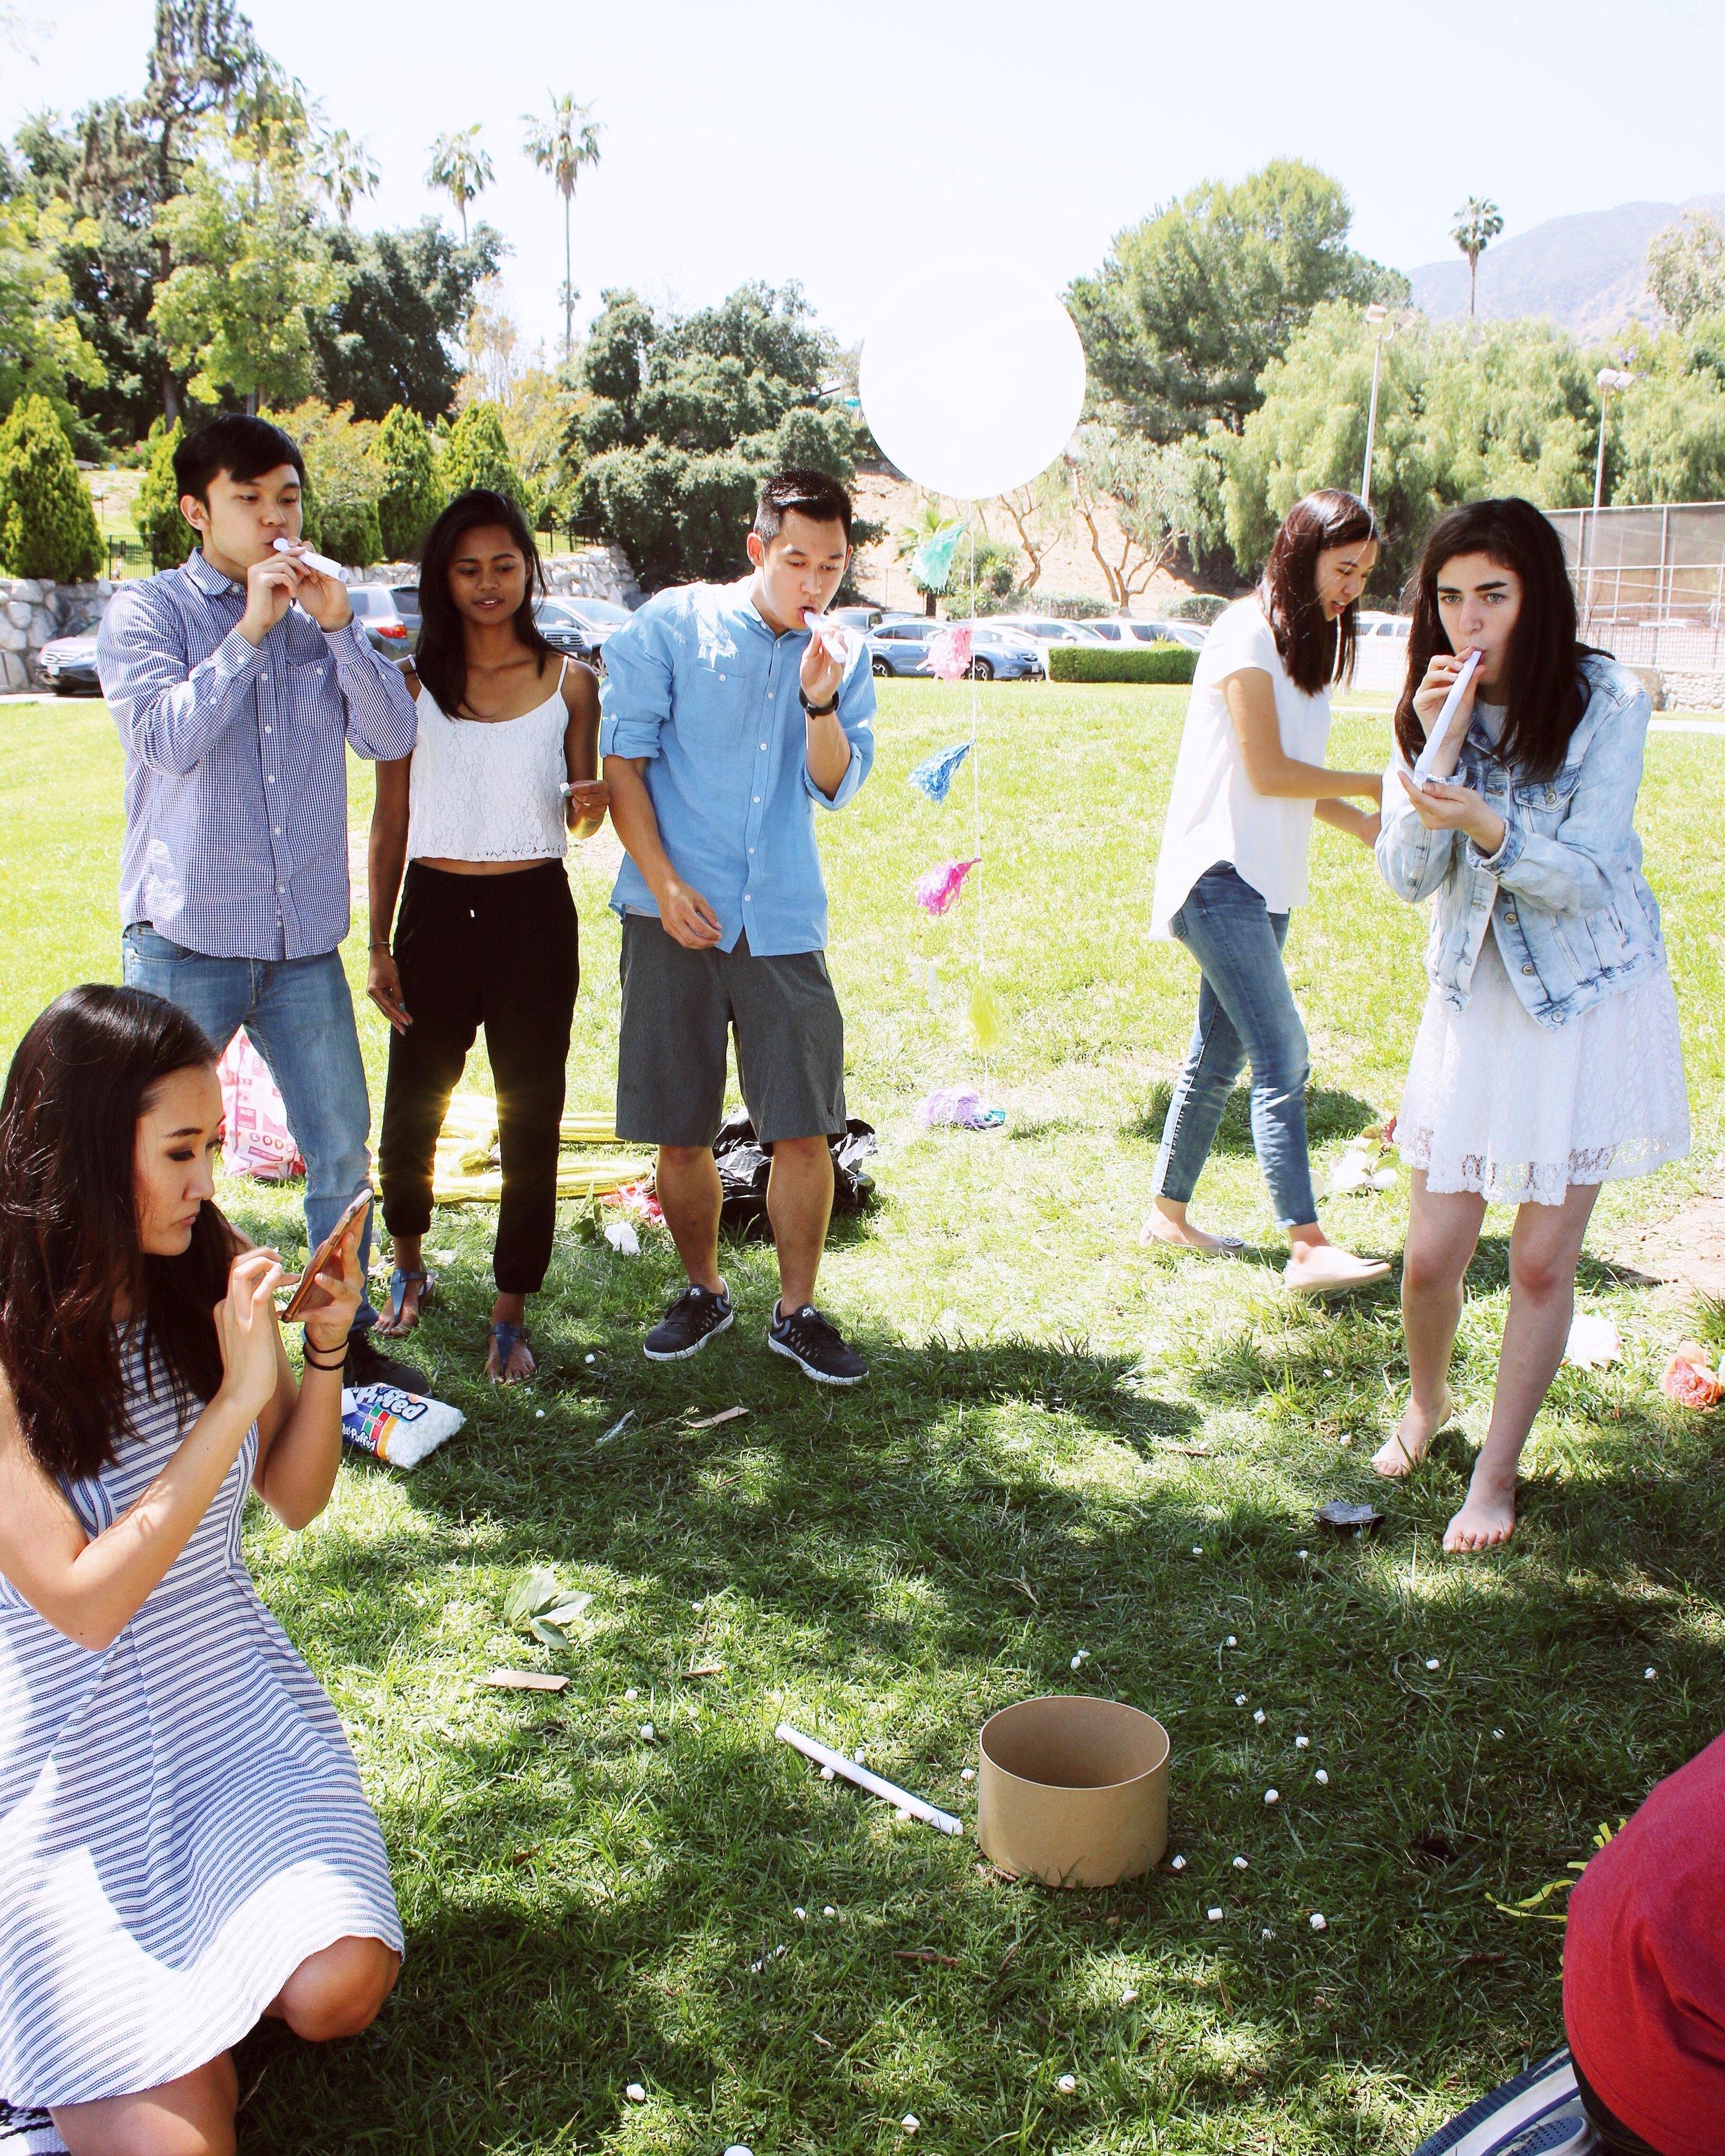 girlandtheword-boho-style-graduation-picnic-party-14